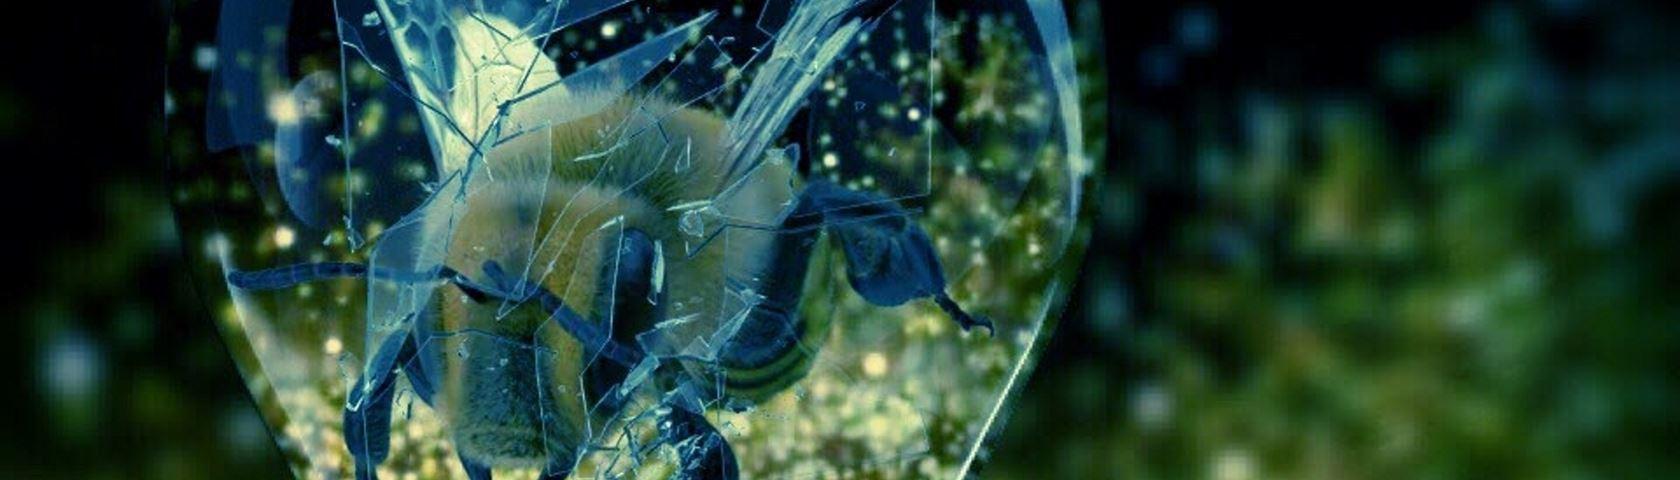 Green Bug Bulb